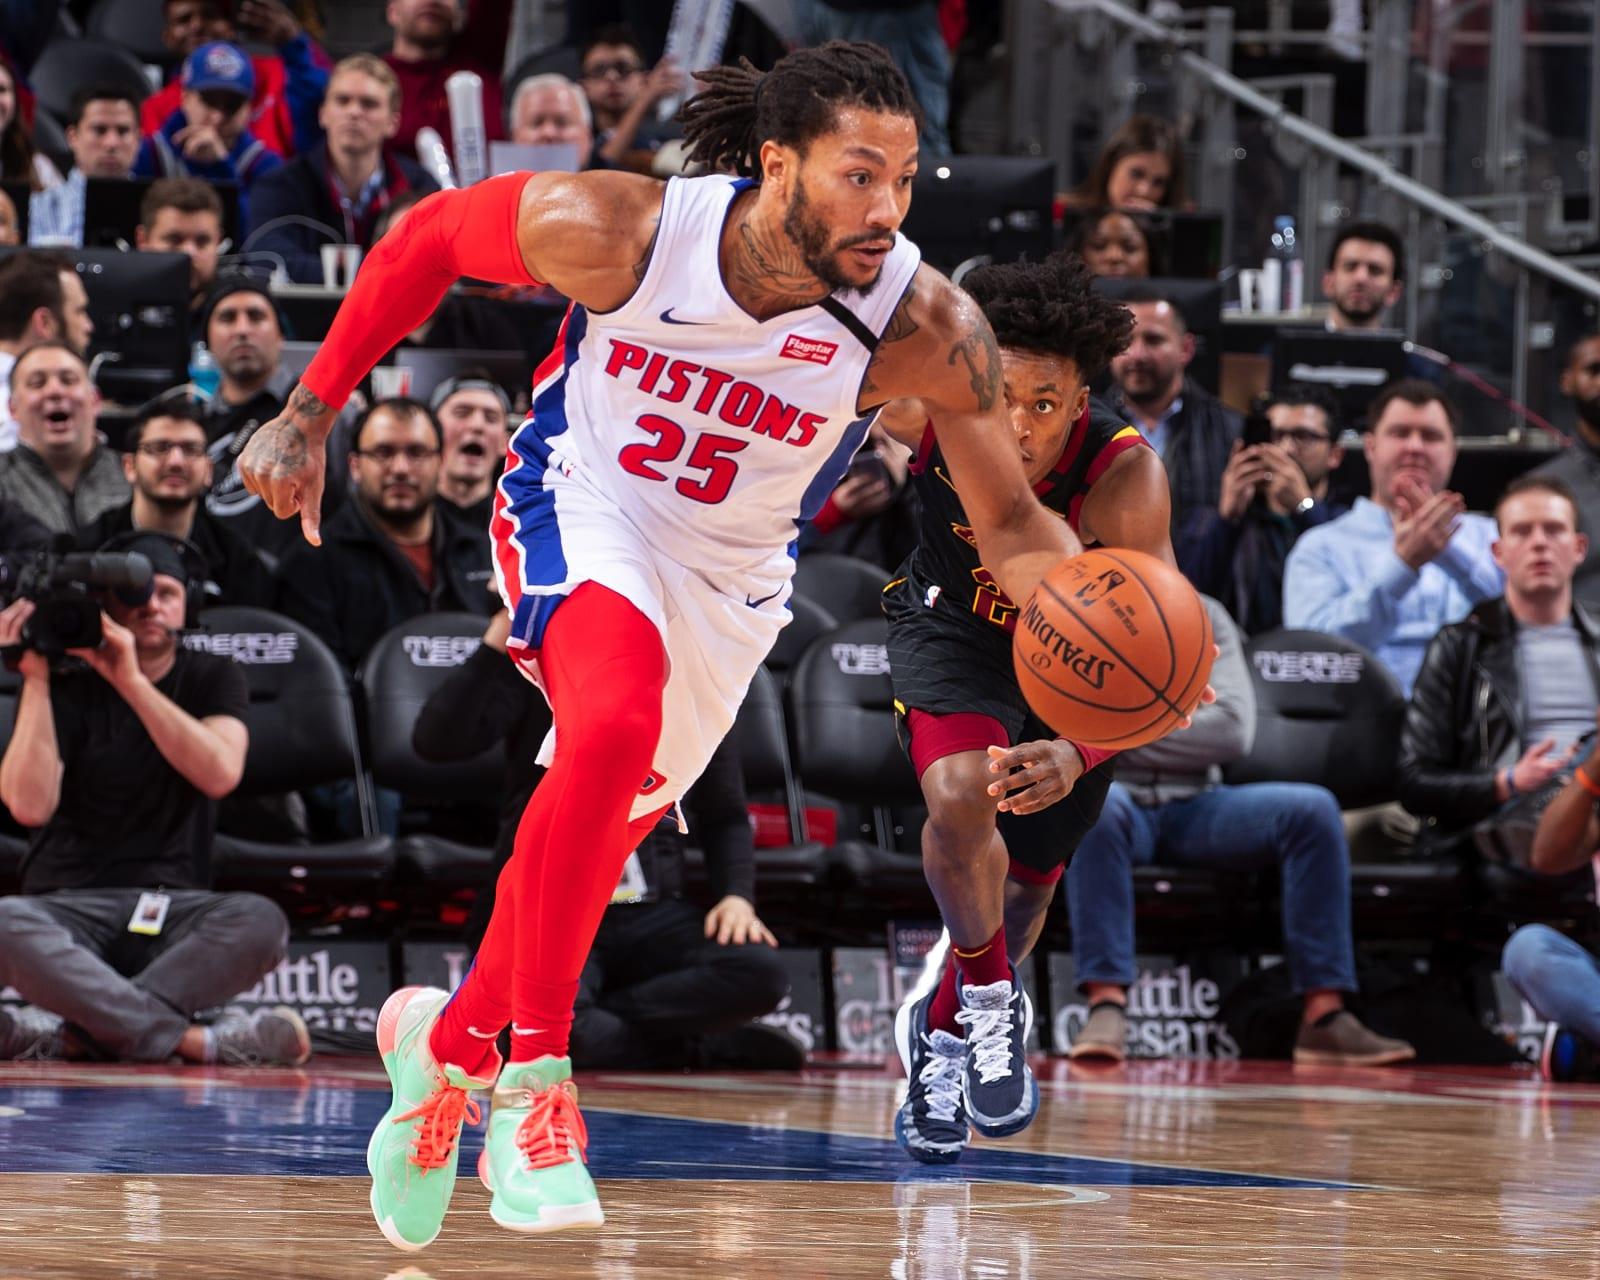 Detroit Pistons 2019-2020 player grade